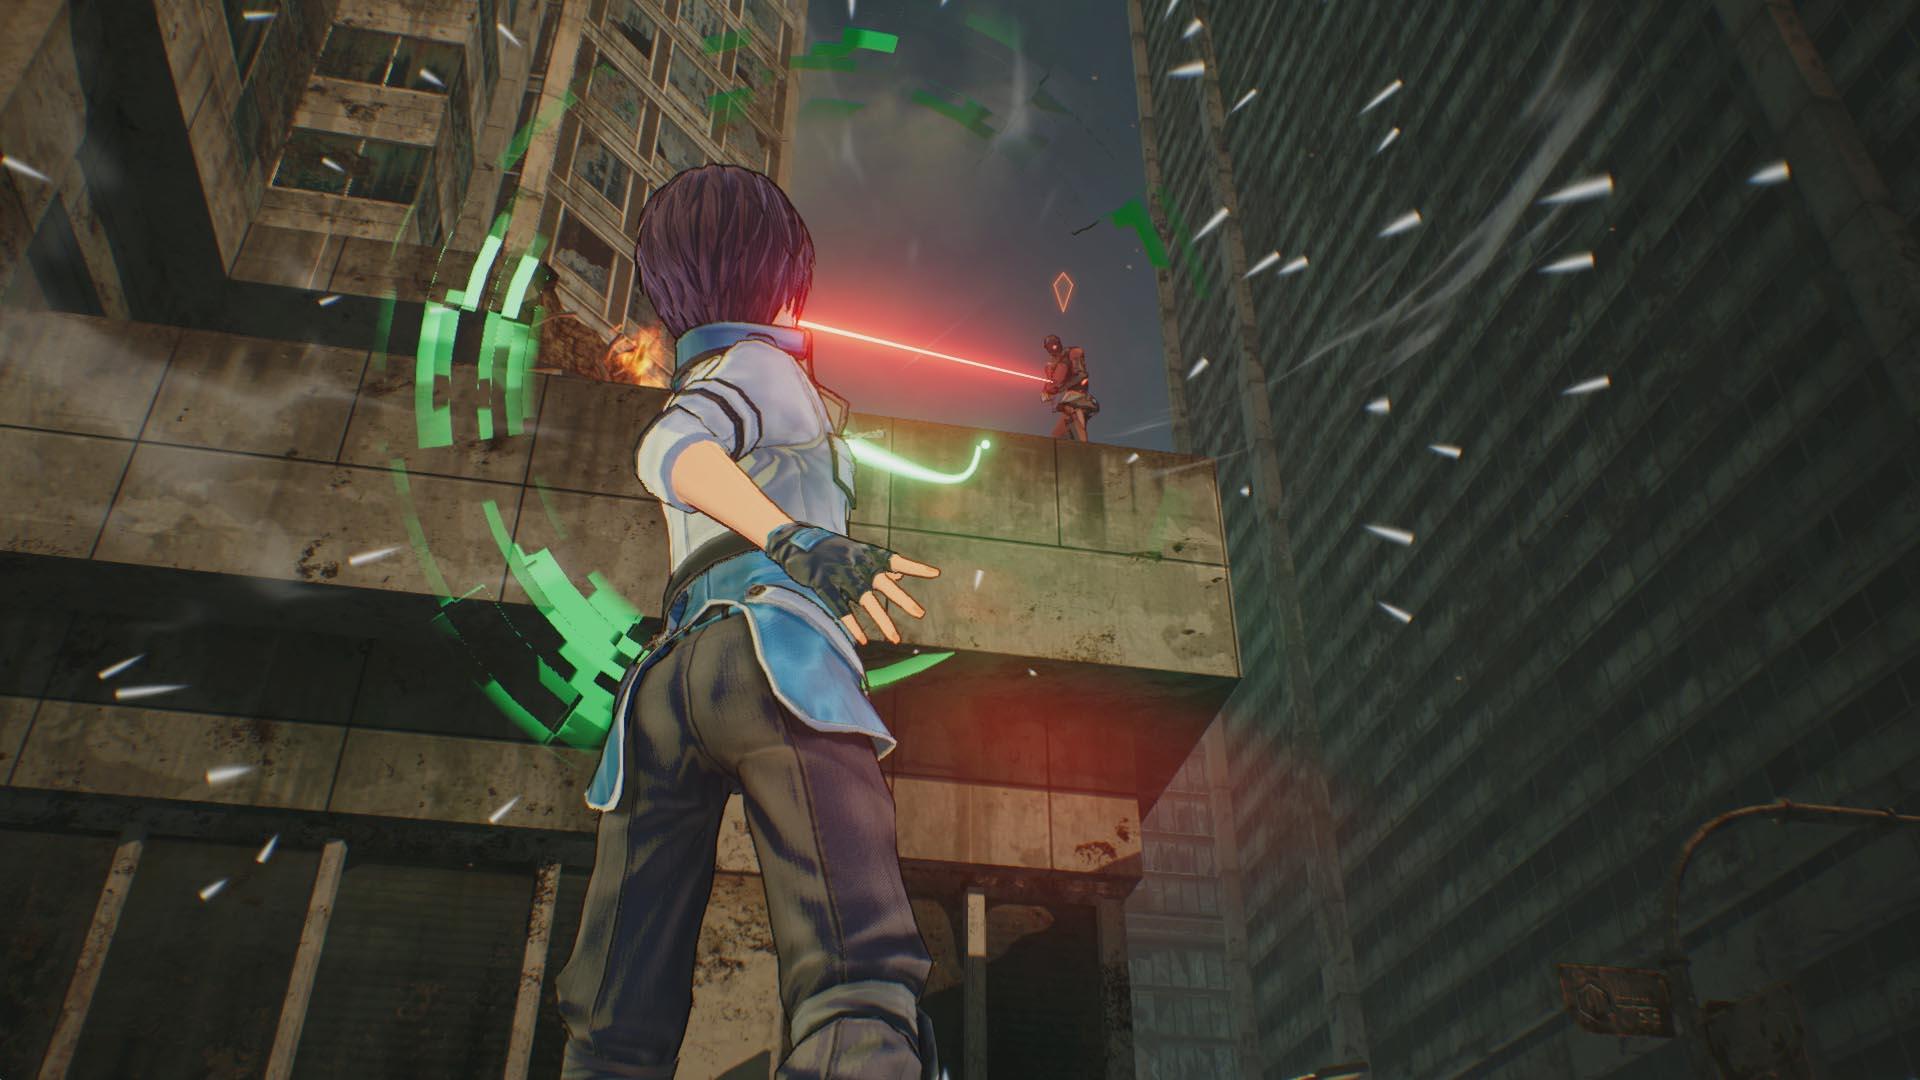 《刀剑神域:夺命凶弹》Sword Art Online:Fatal Bullet 中文汉化